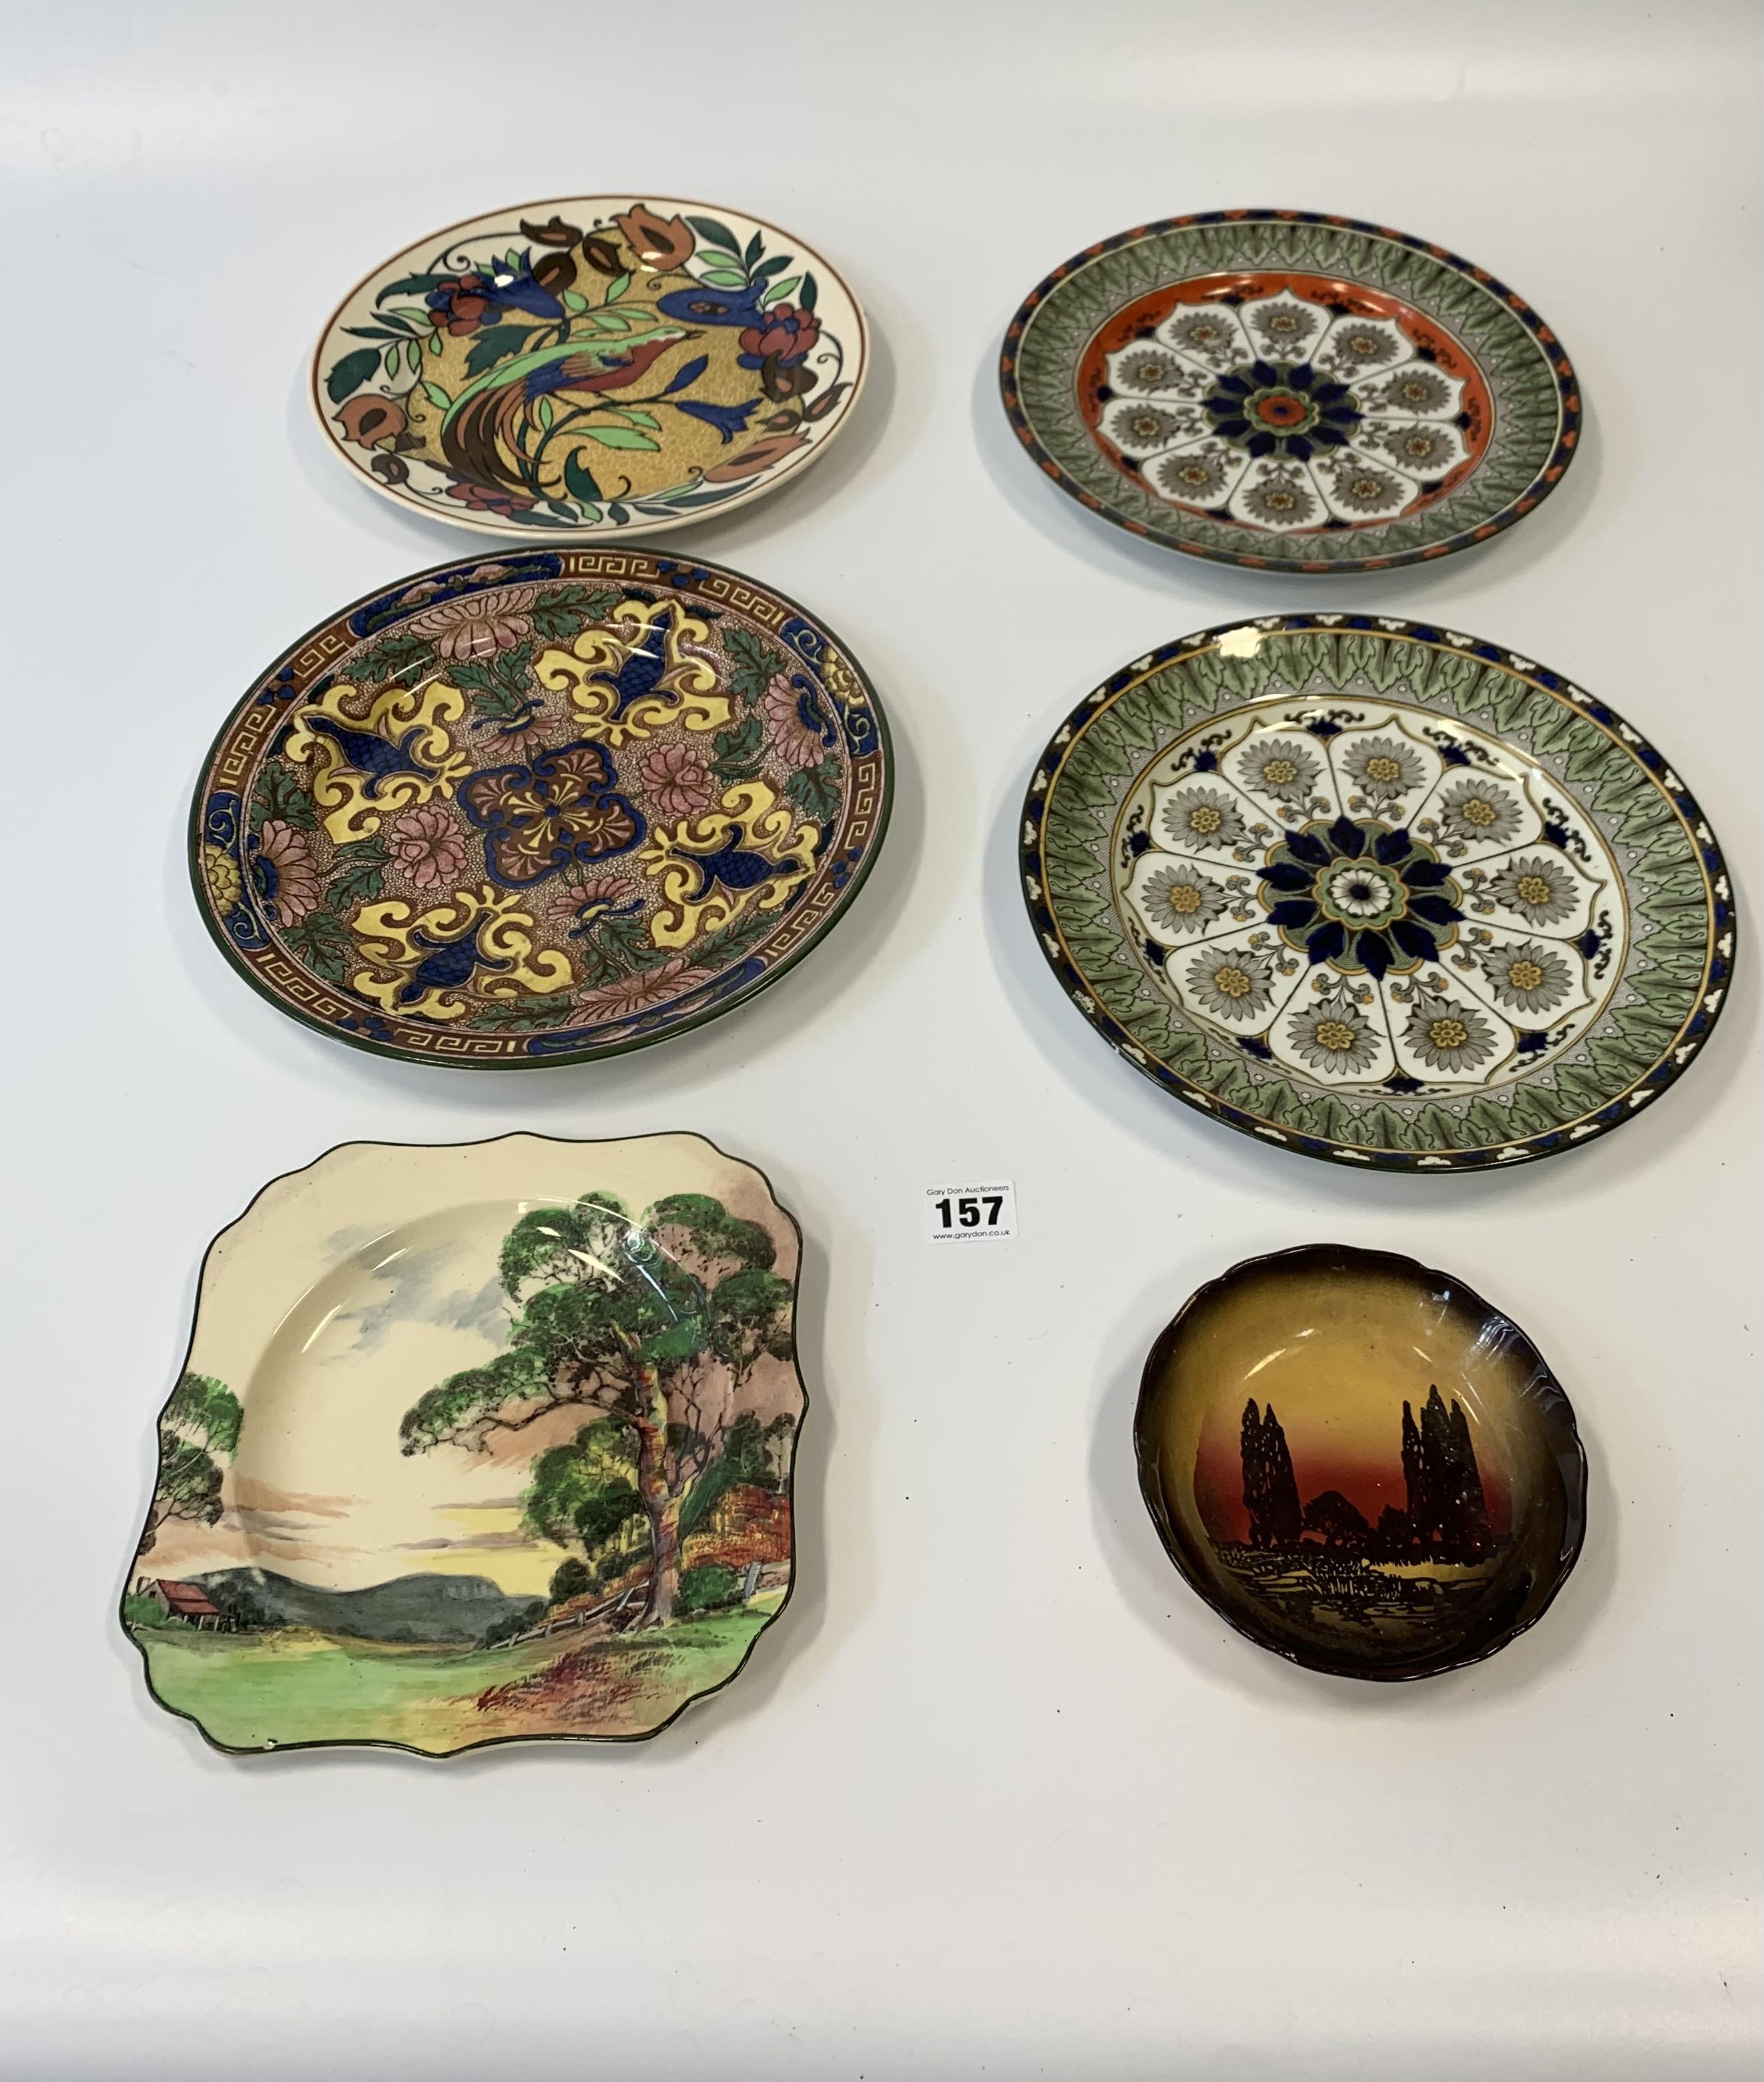 "4 Royal Doulton plates, 10.5"" diameter, shaped Royal Doulton plate 9"" diameter and Royal Doulton"